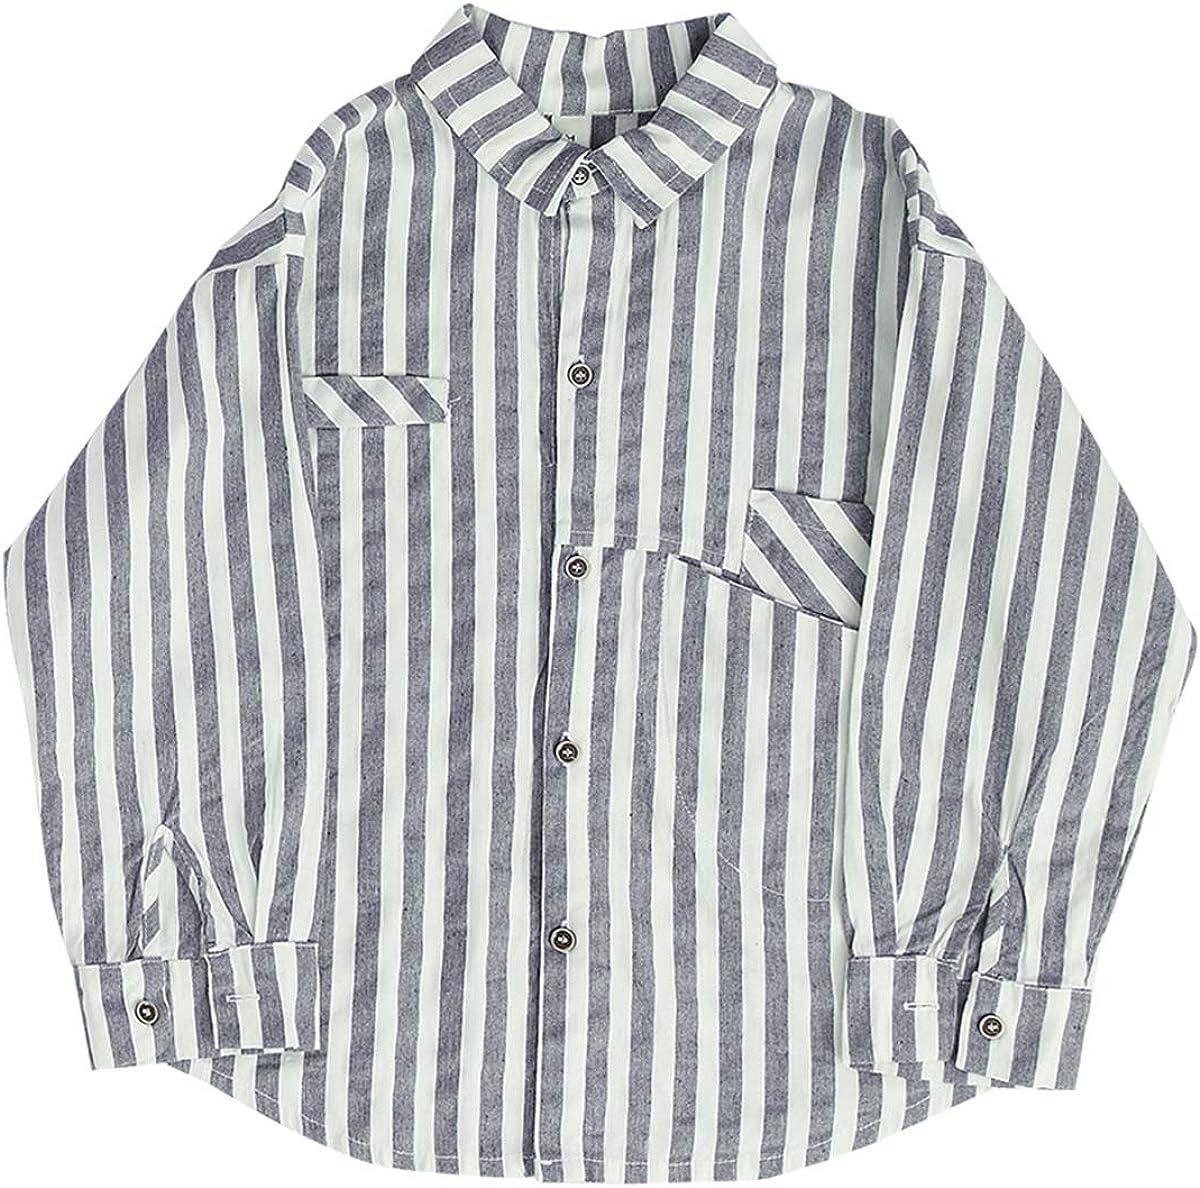 Mason Island Little Boys Kids Autumn Button Down Long Sleeve Shirt Toddler Loose Clothes